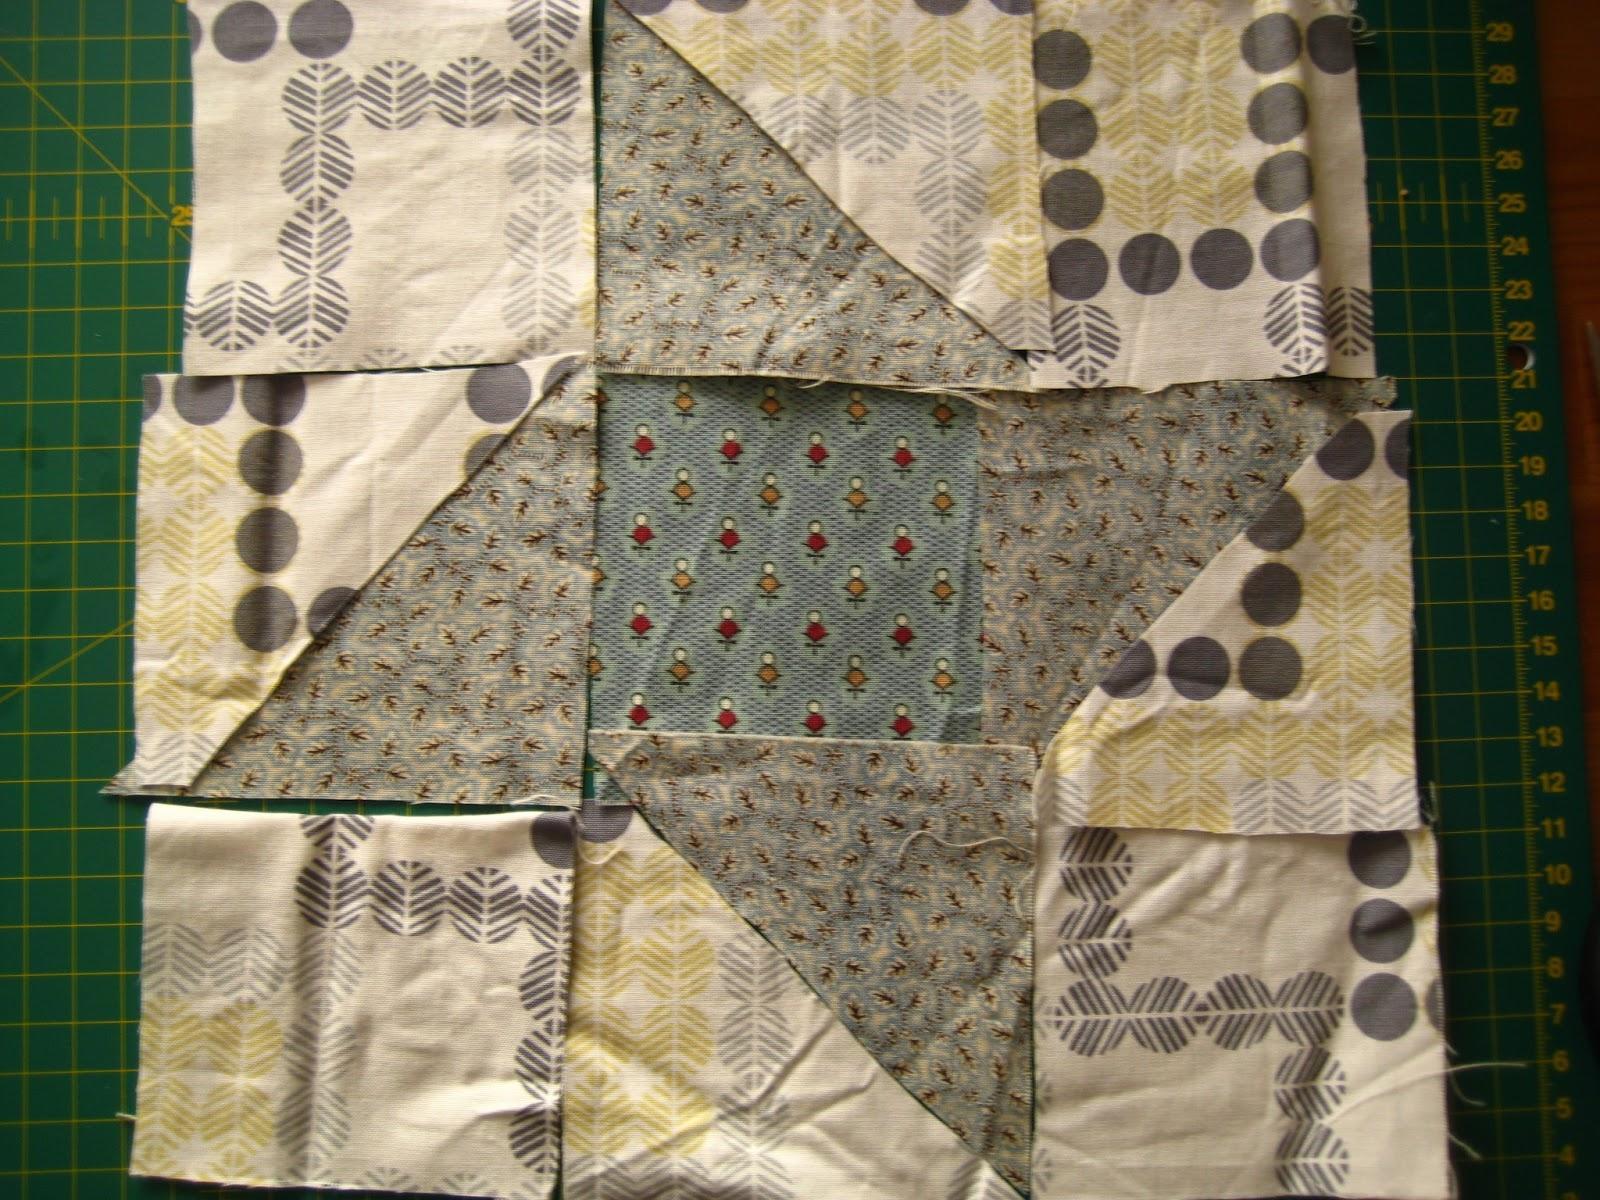 Alfamatic aprende a coser agarrador de cocina patchwork - Patchwork para cocina ...